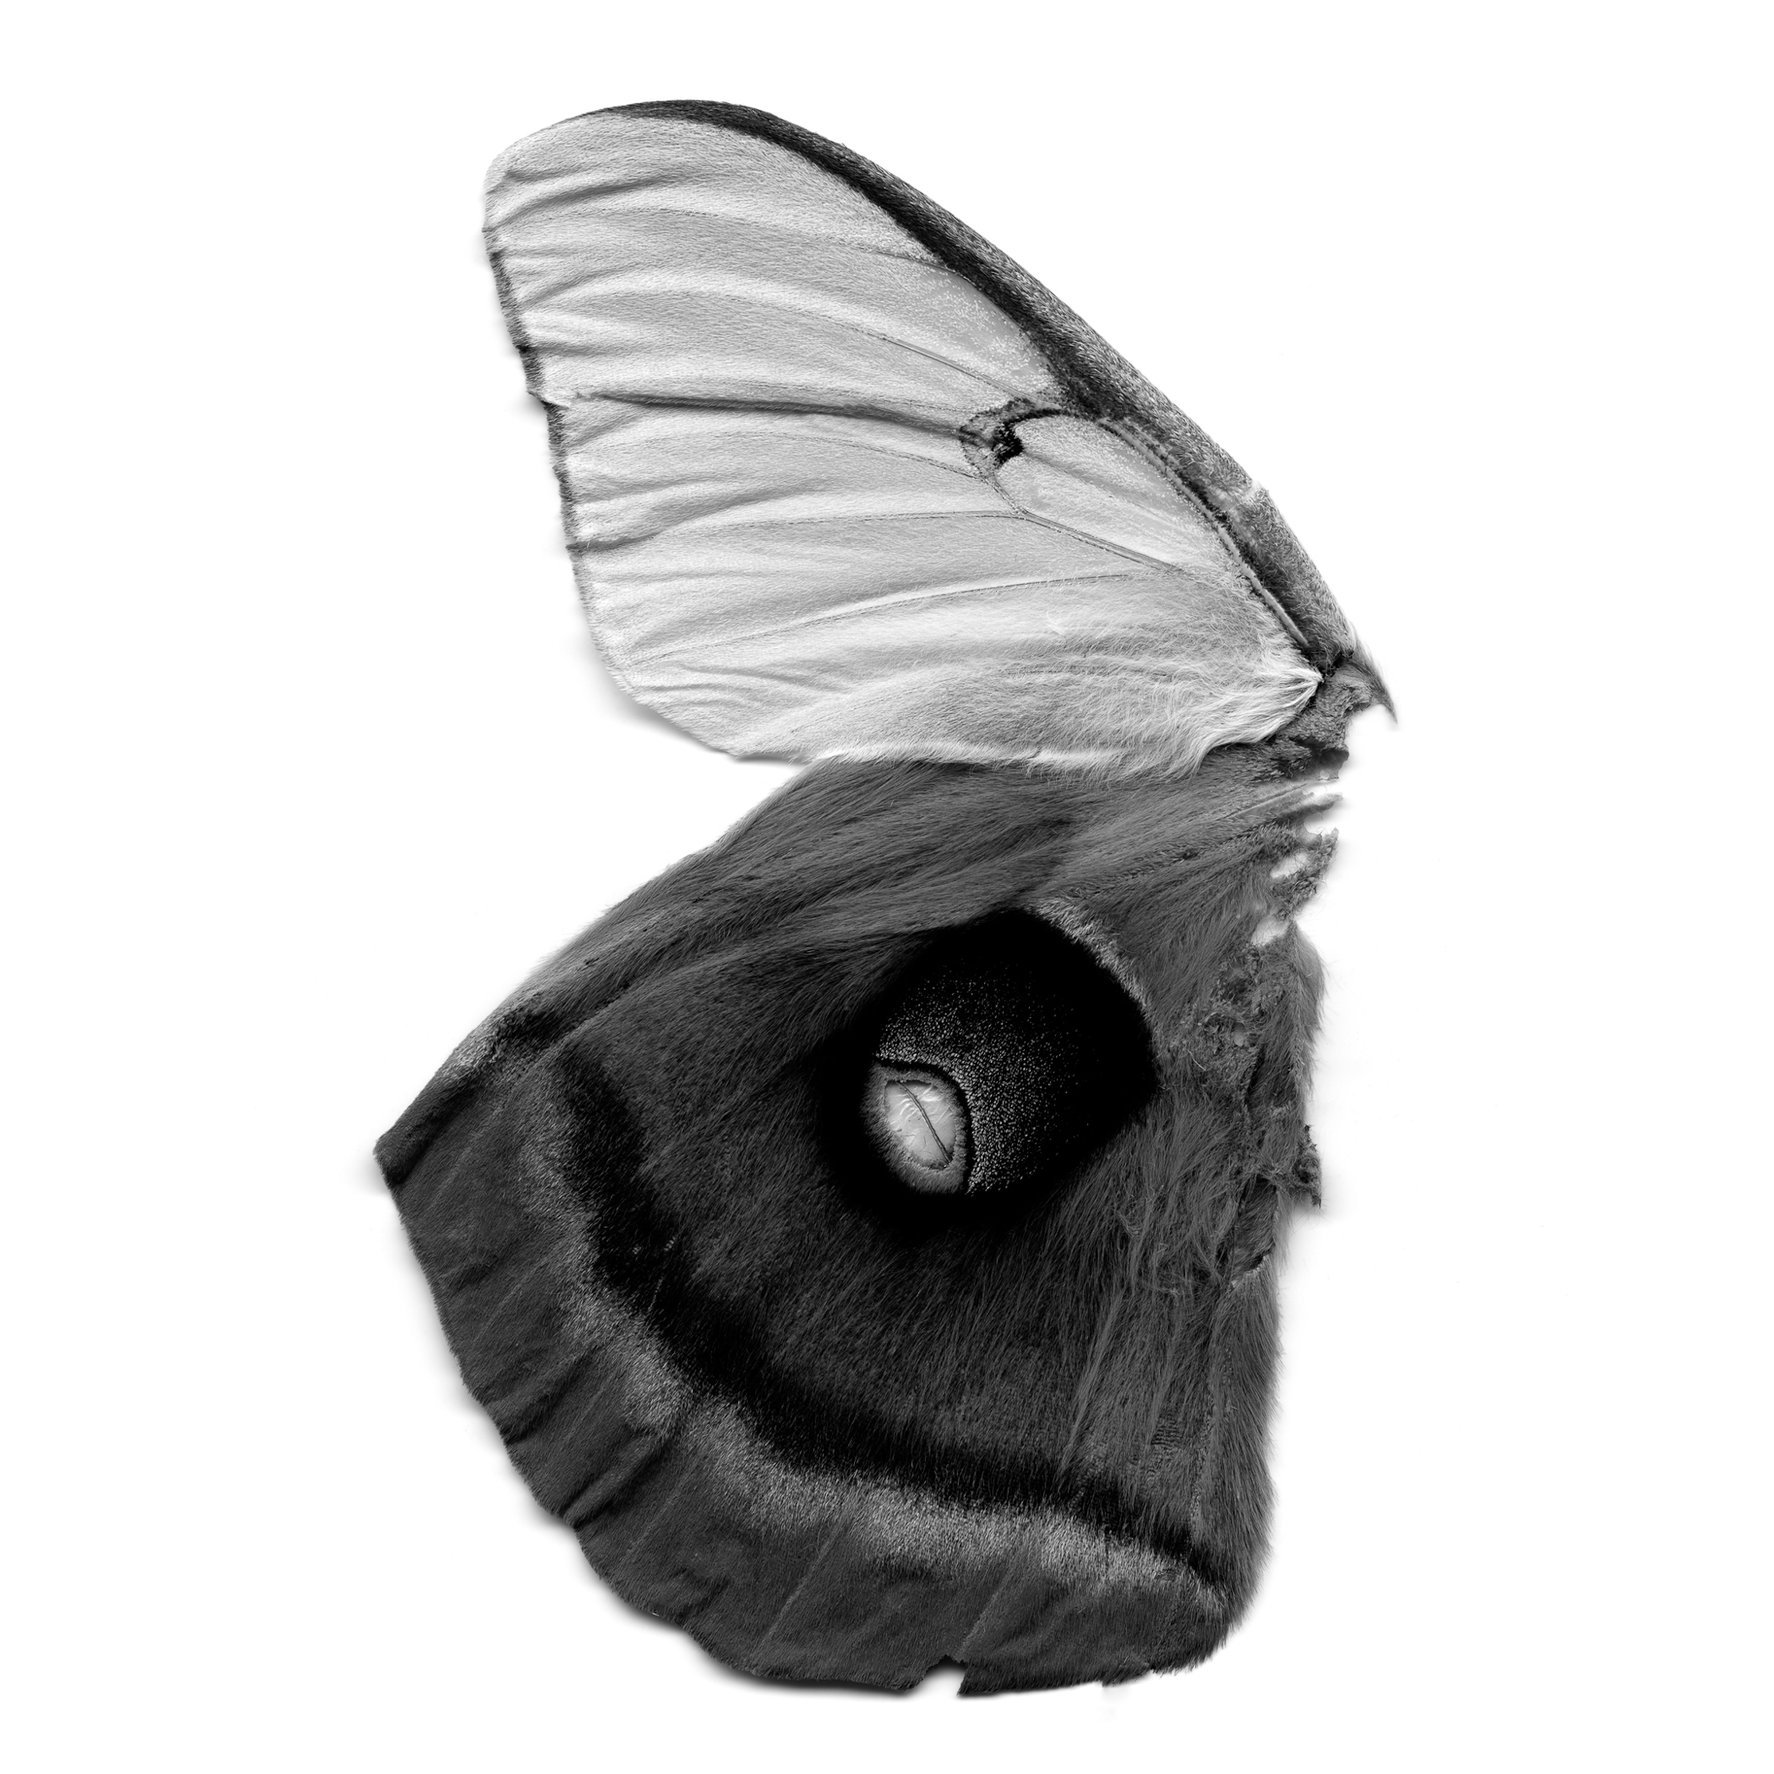 Moth Wings (female luna, male polyphemus), 21st century